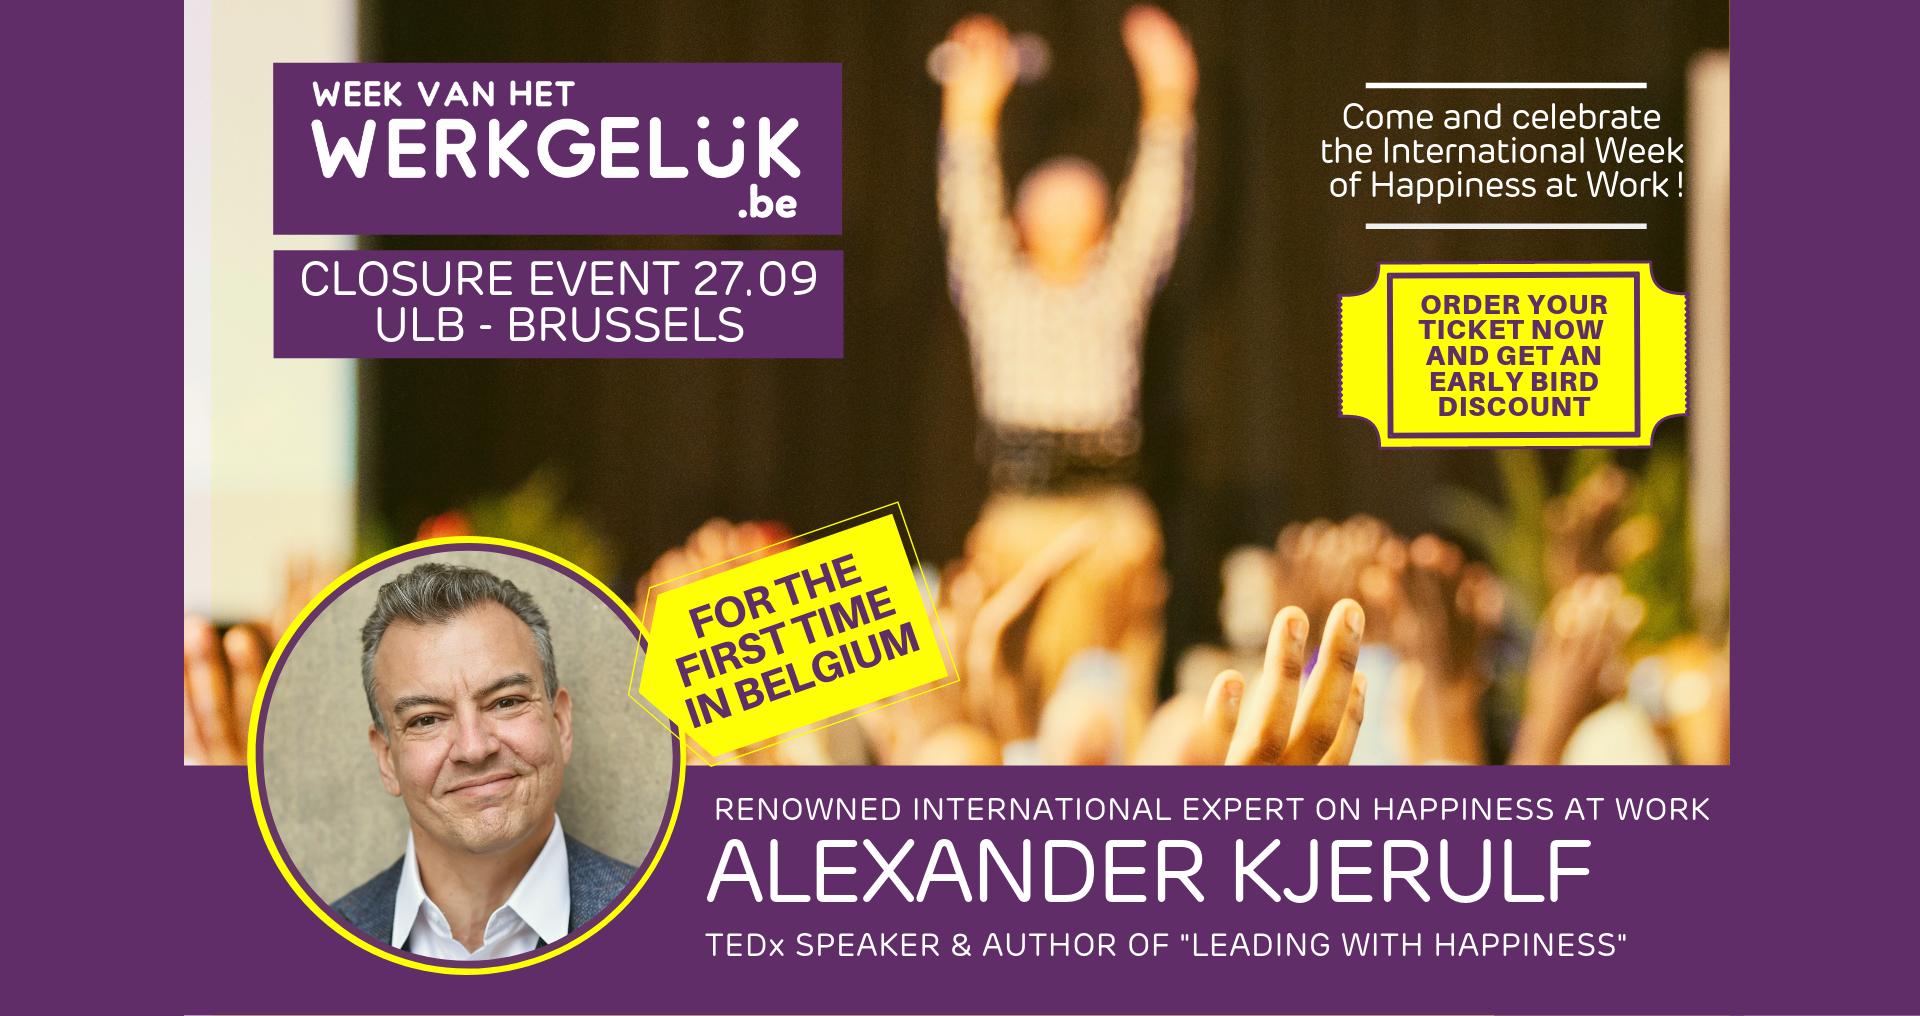 alexander kjerulf expert happiness at work